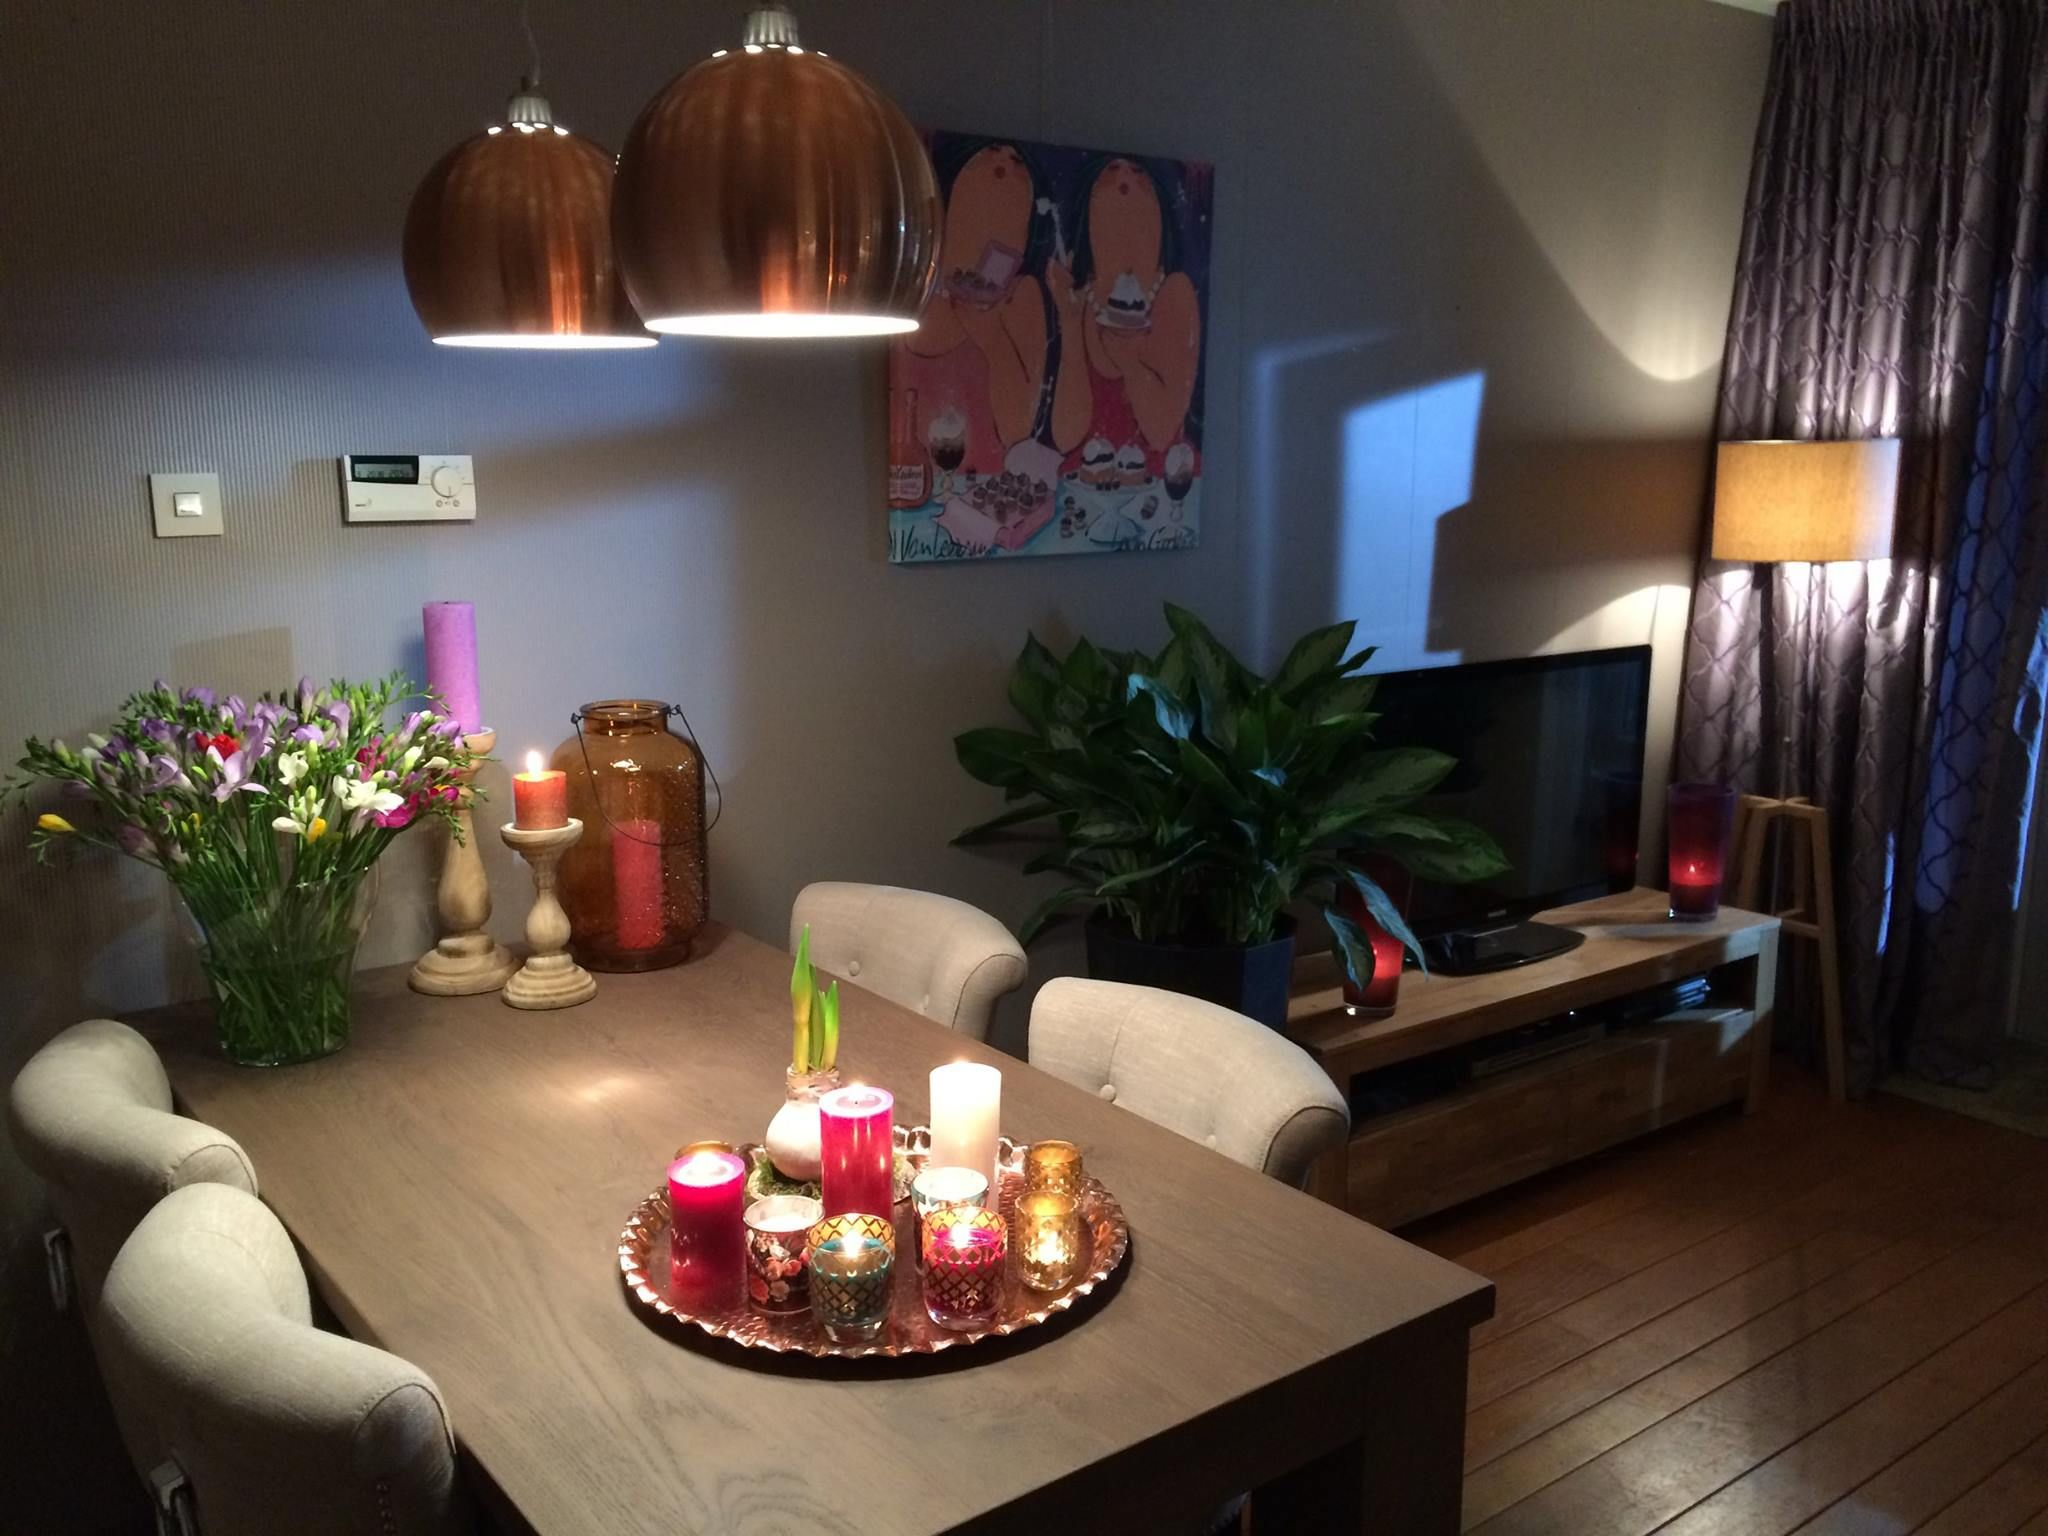 Tuinverbouwing Nieuwe Vloer : Cosy restyling livingroom bij robs grote tuinverbouwing home